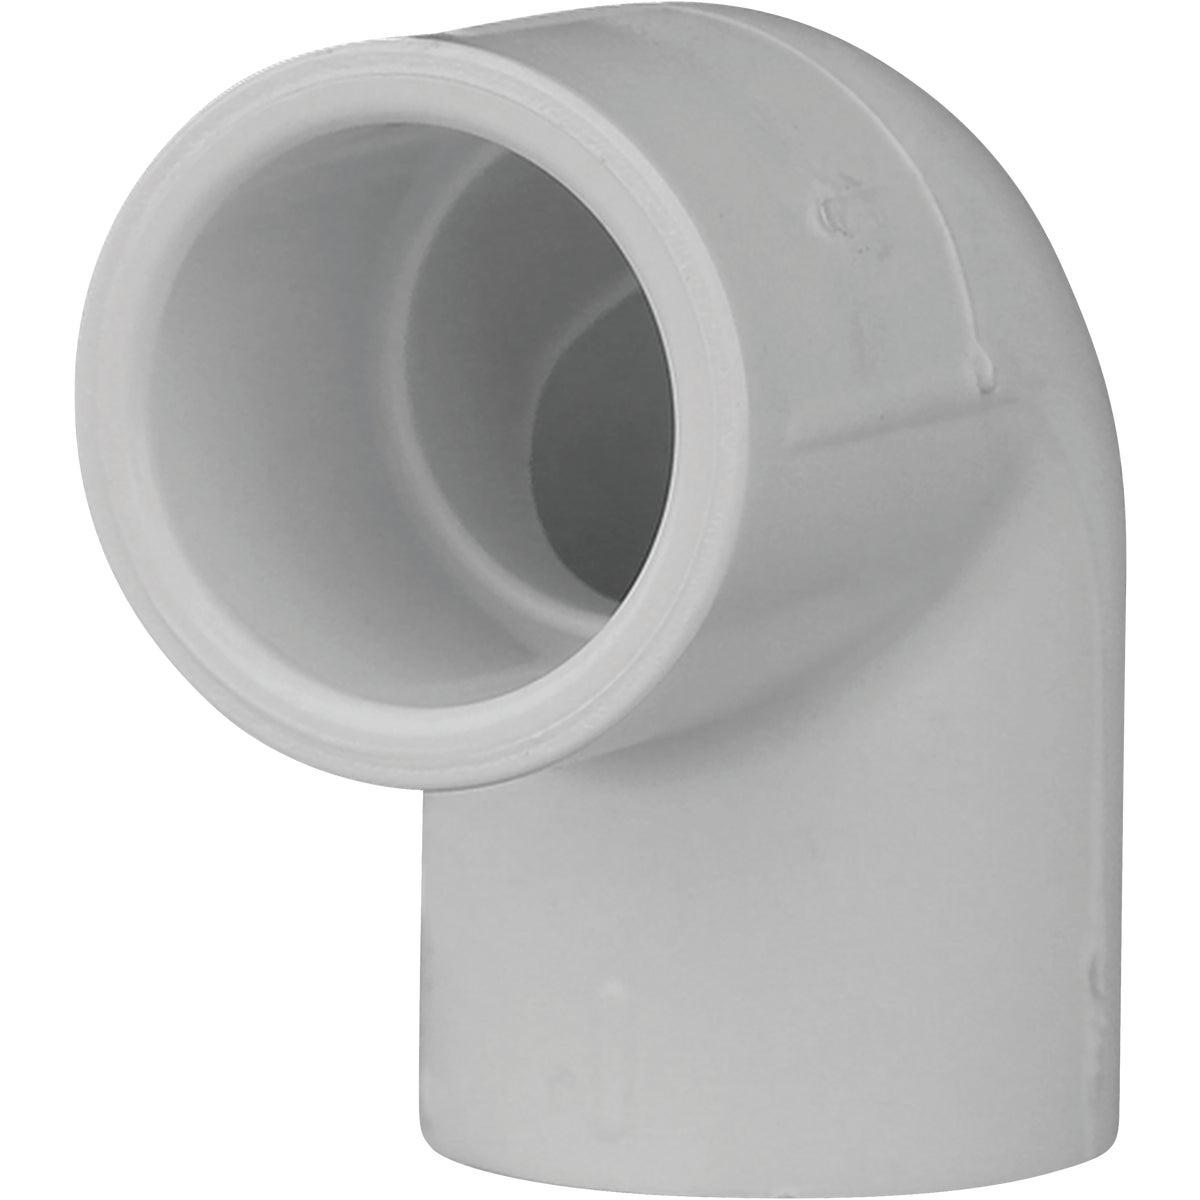 "1/2"" 90D SCH40 PVC ELBOW - 30705 by Genova Inc"